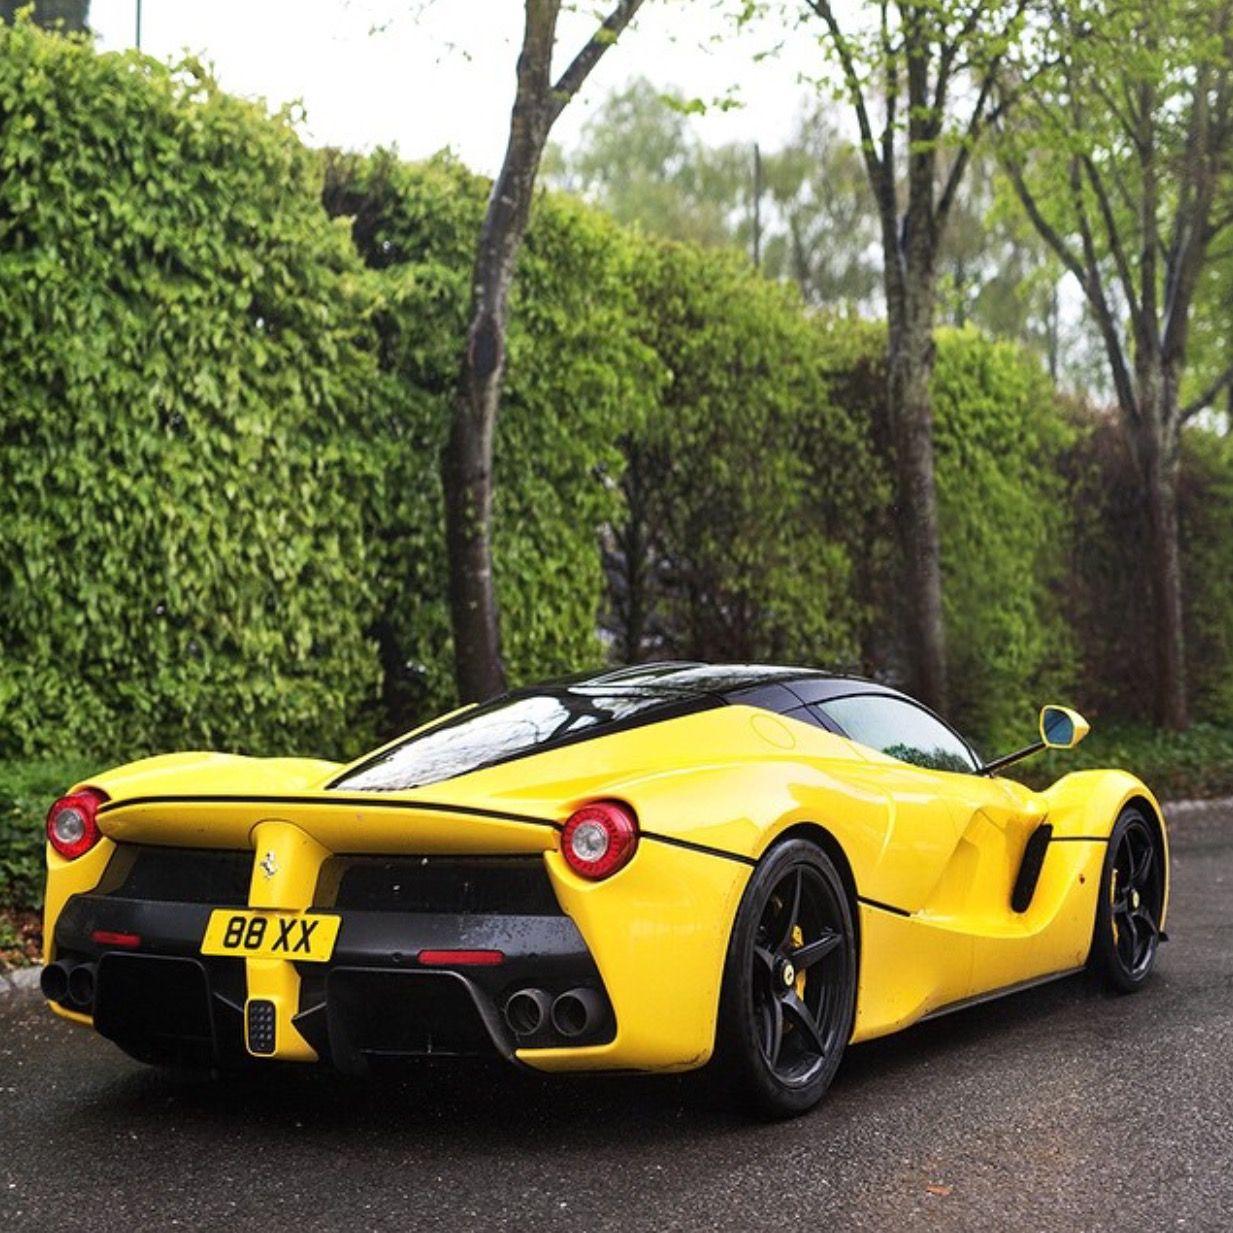 Ferrari LaFerrari painted in Giallo Triplo Strato Photo taken by: @AlexPenfold on Instagram